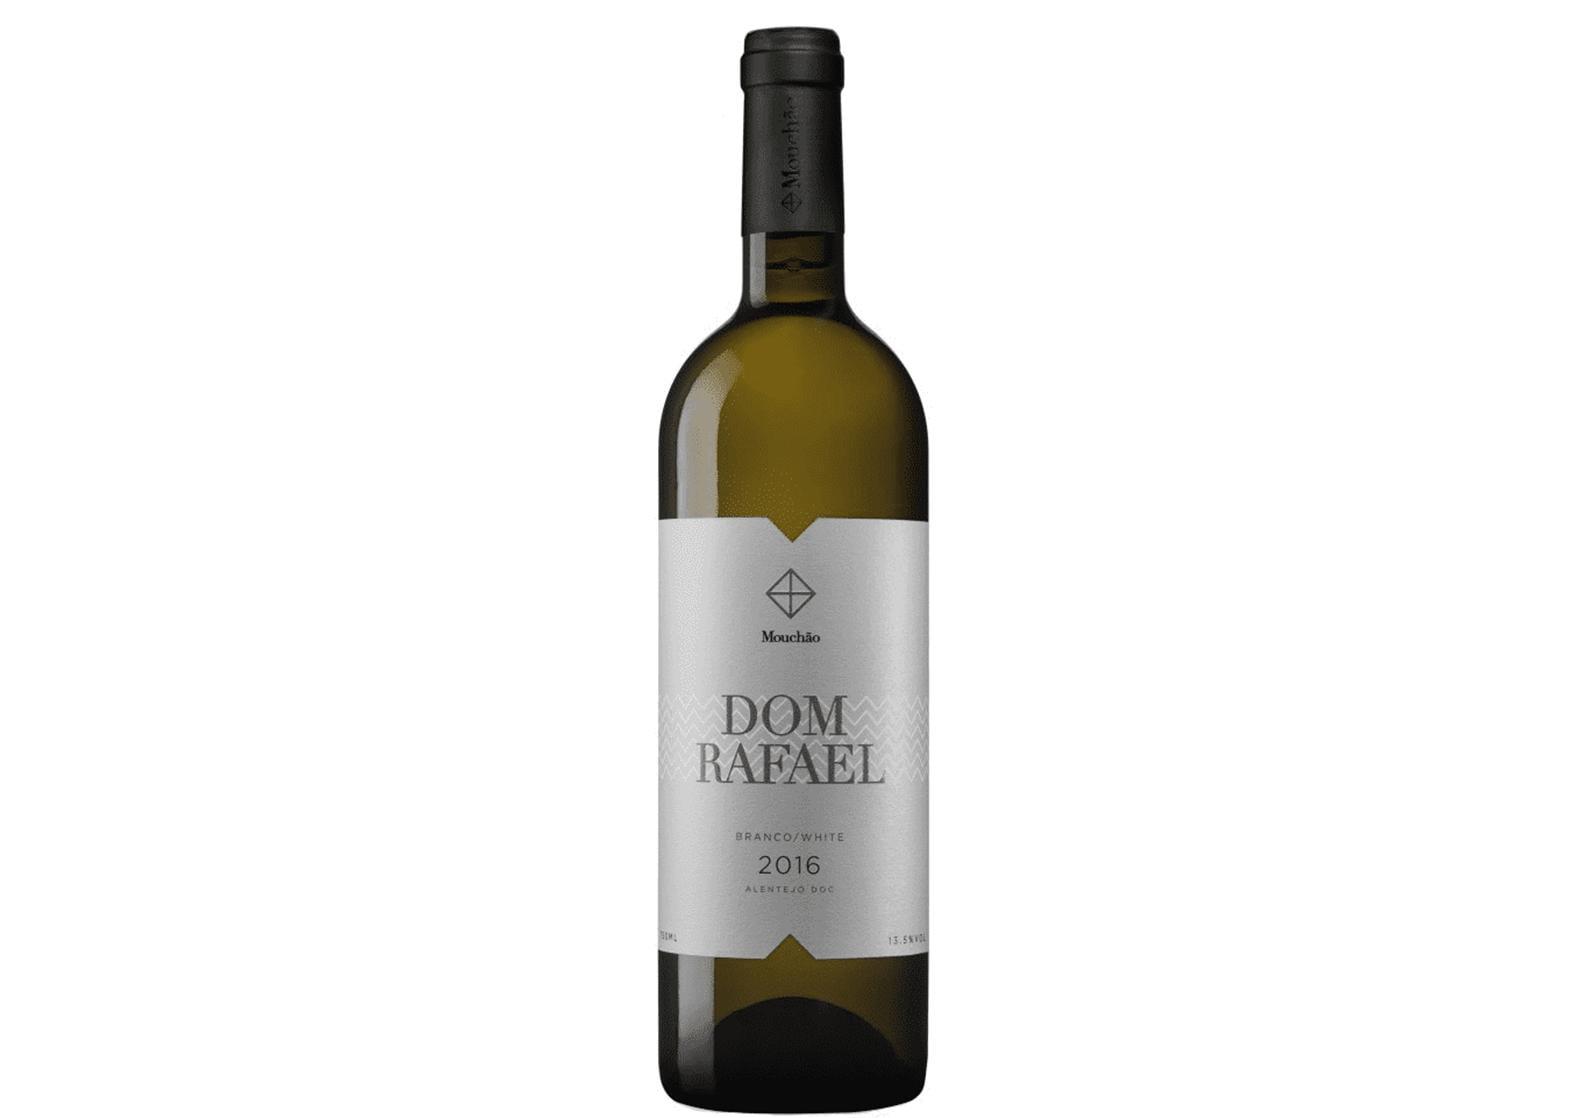 Herdade do Mouchao - Dom Rafael Blanc - Vins de l'Alentejo